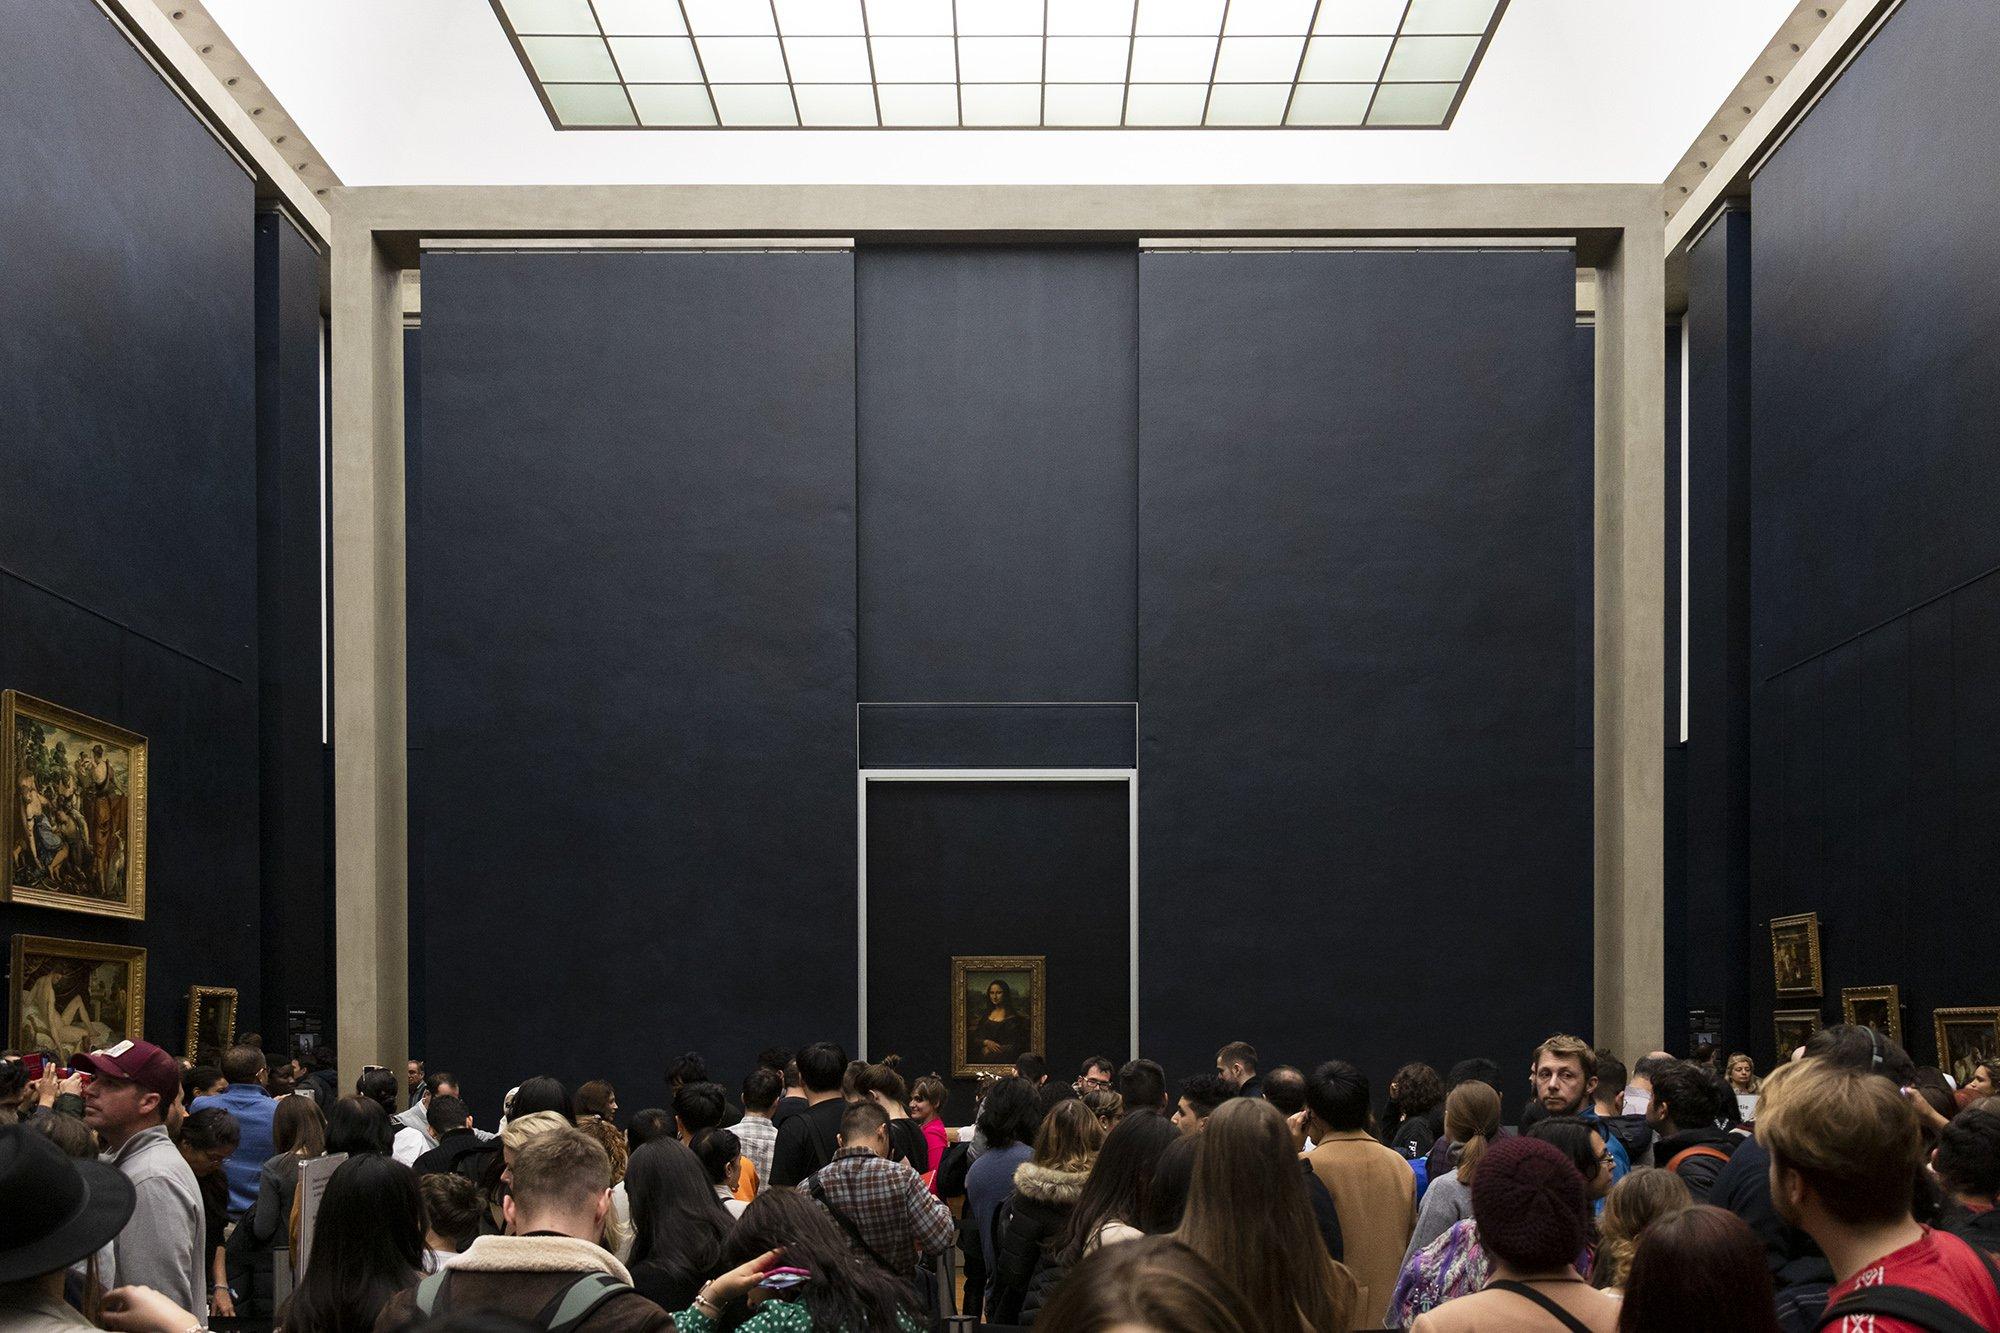 Mona Lisa room - Louvre, Paris